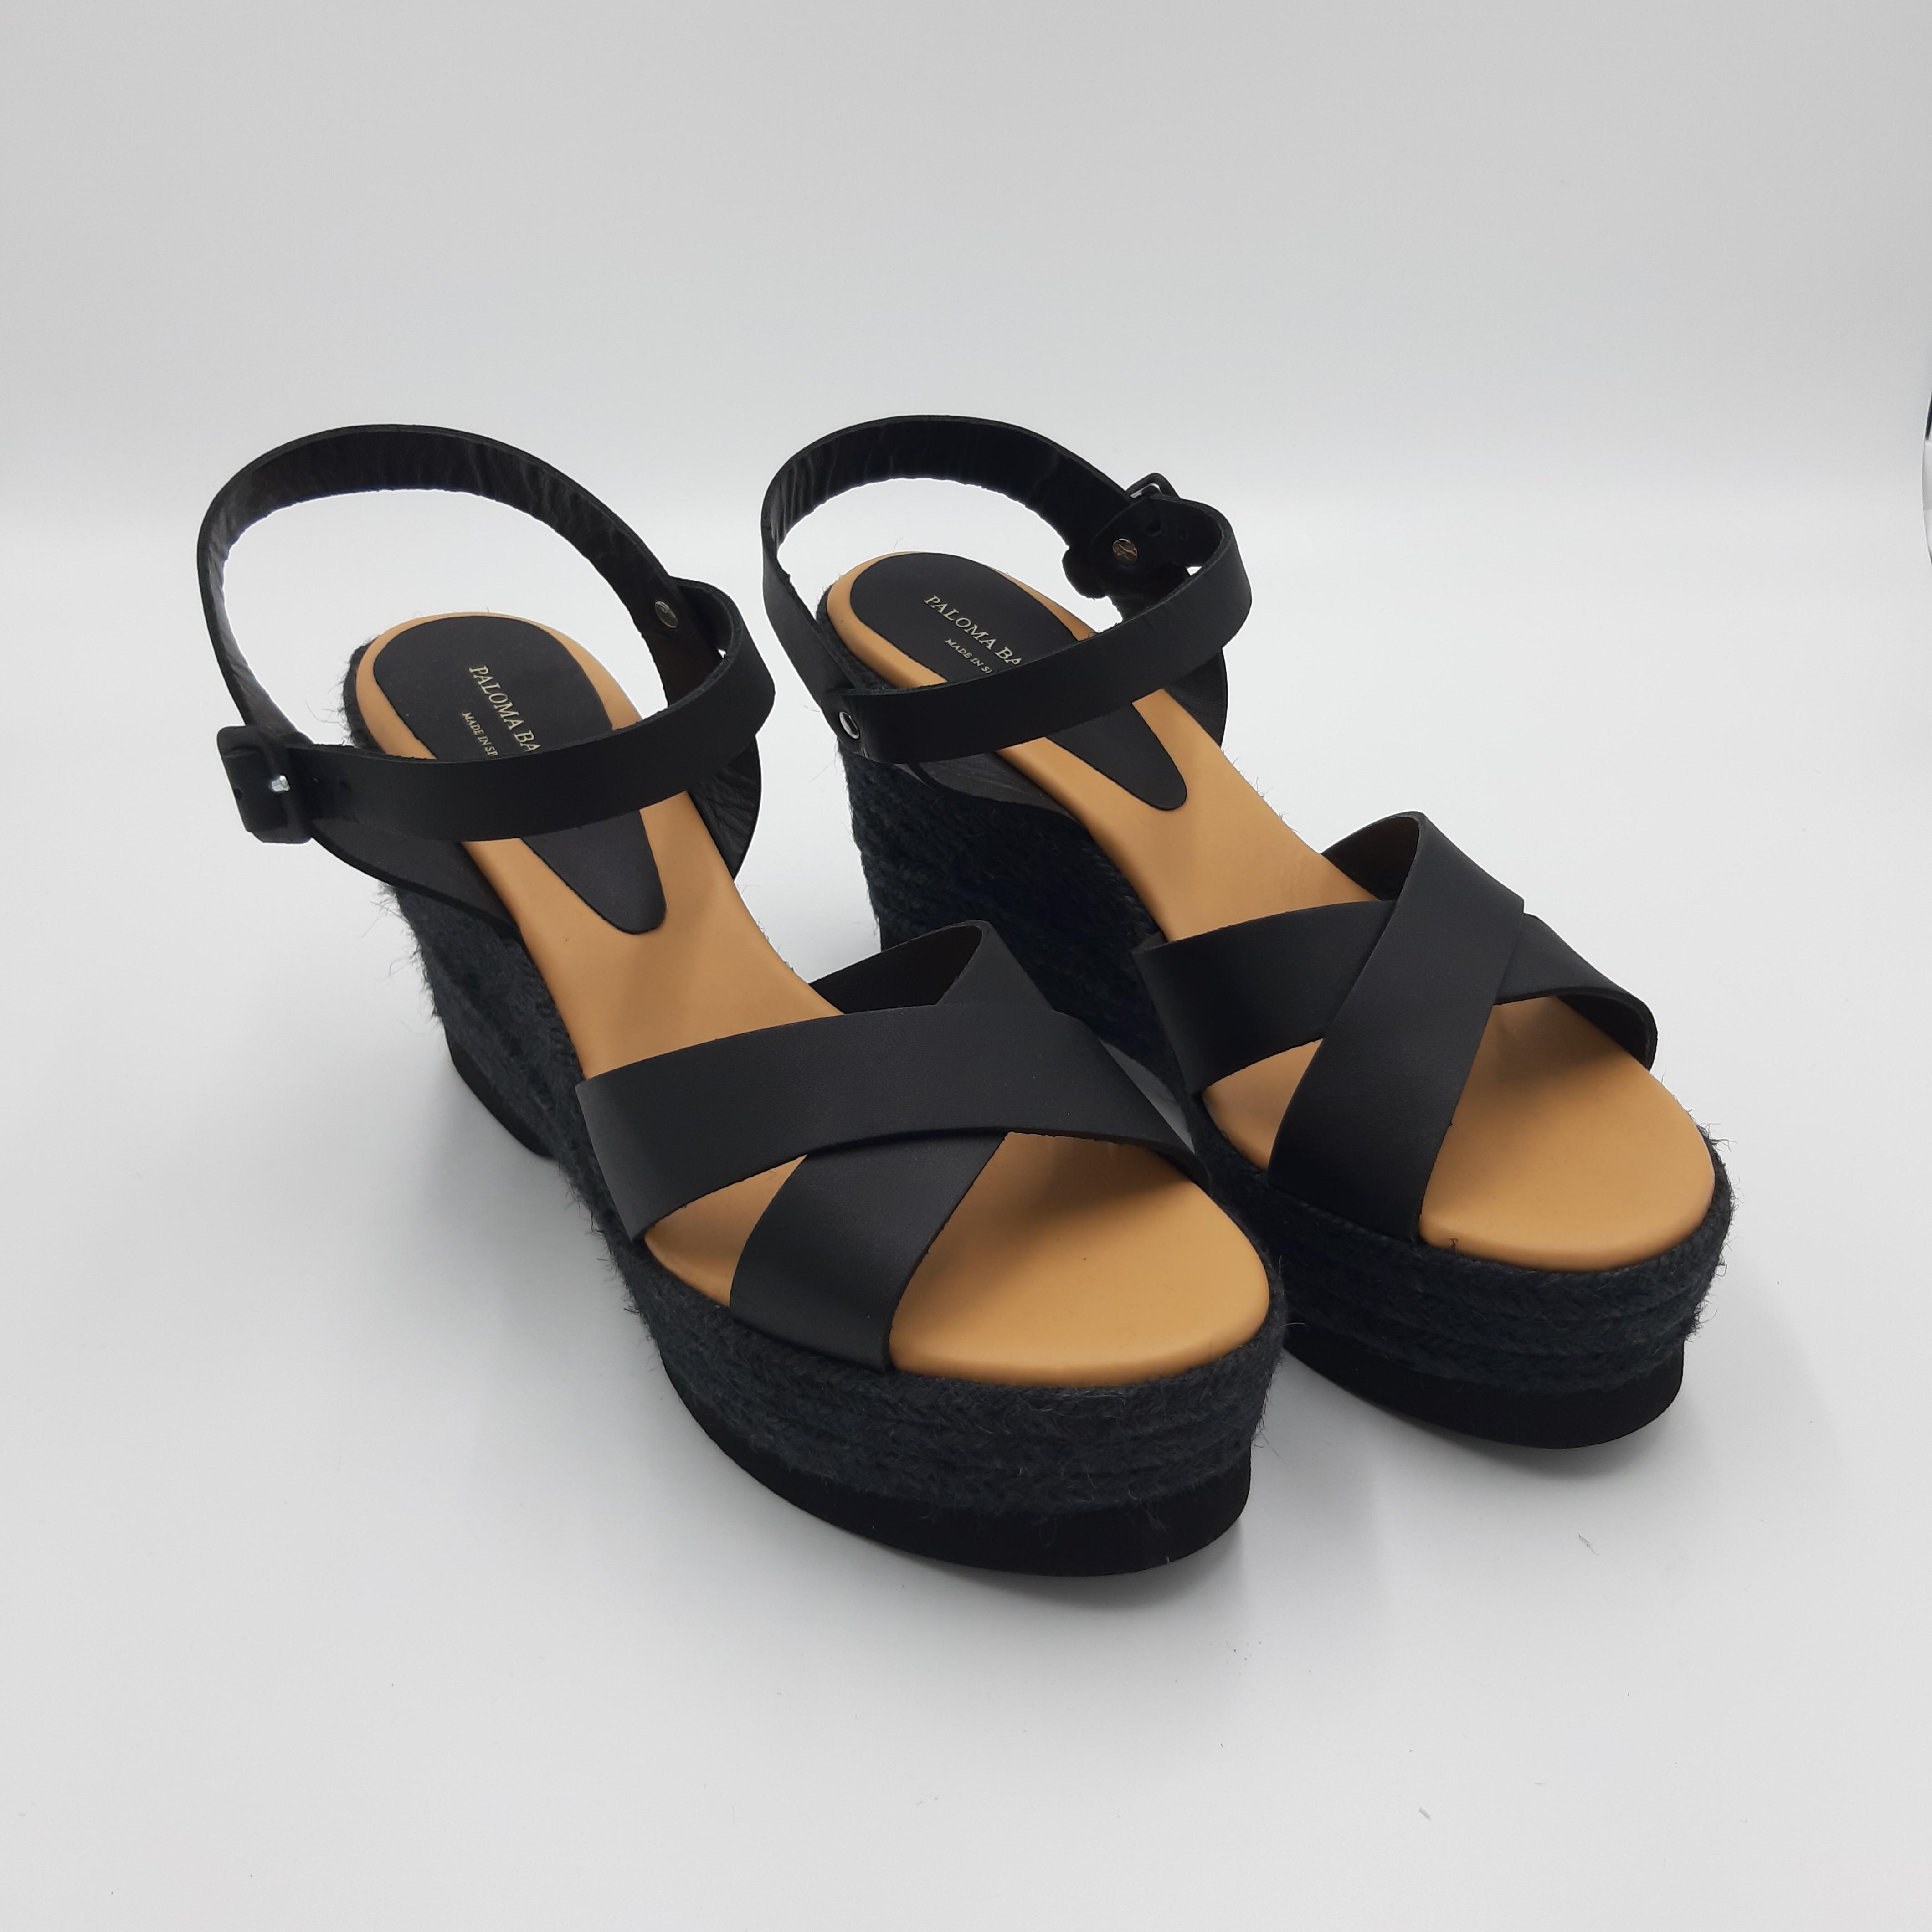 Sandalo zeppa Haru Paloma Barcelò